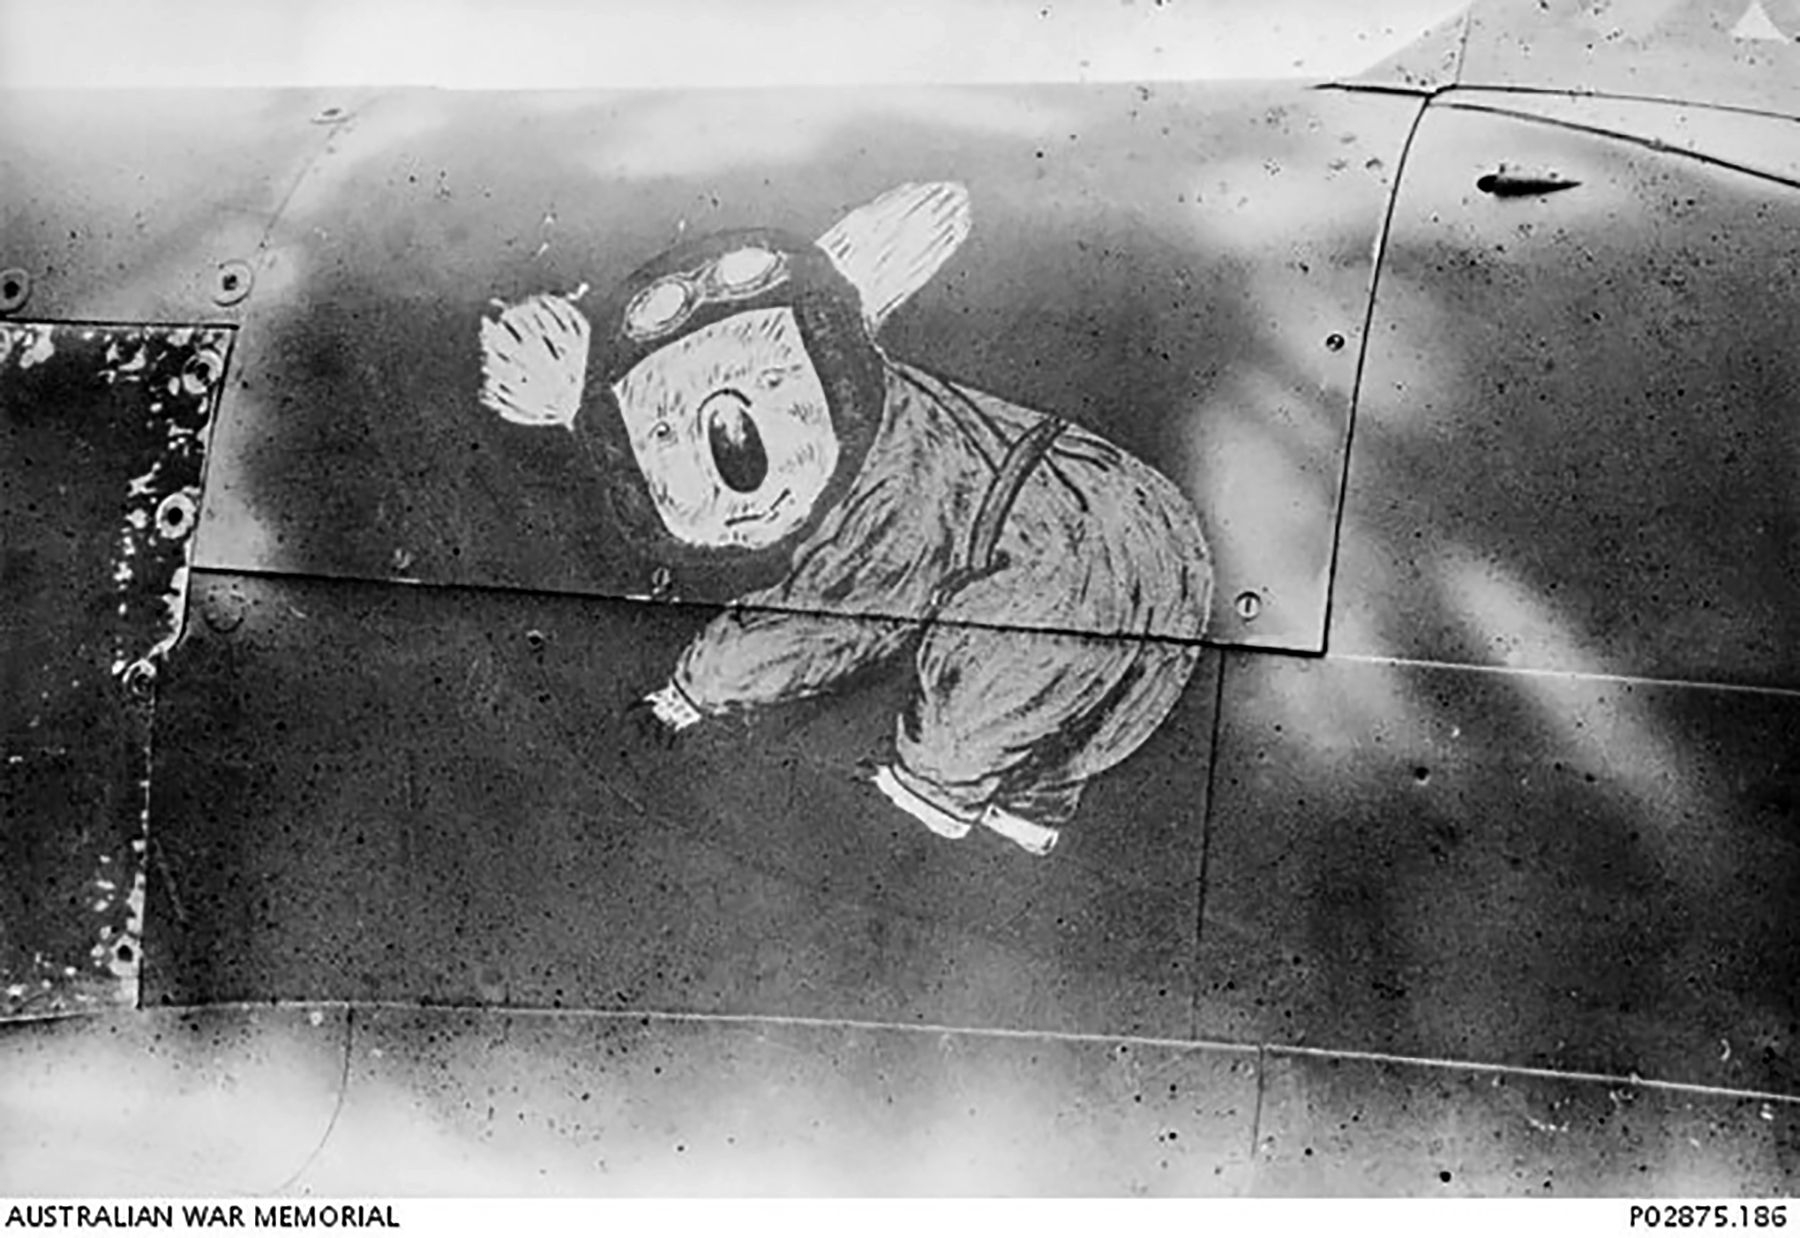 Spitfire MkVc RAAF 79Sqn Koala nose art at Kiriwina Trobriand Islands PNG Sep 1943 IWM 01